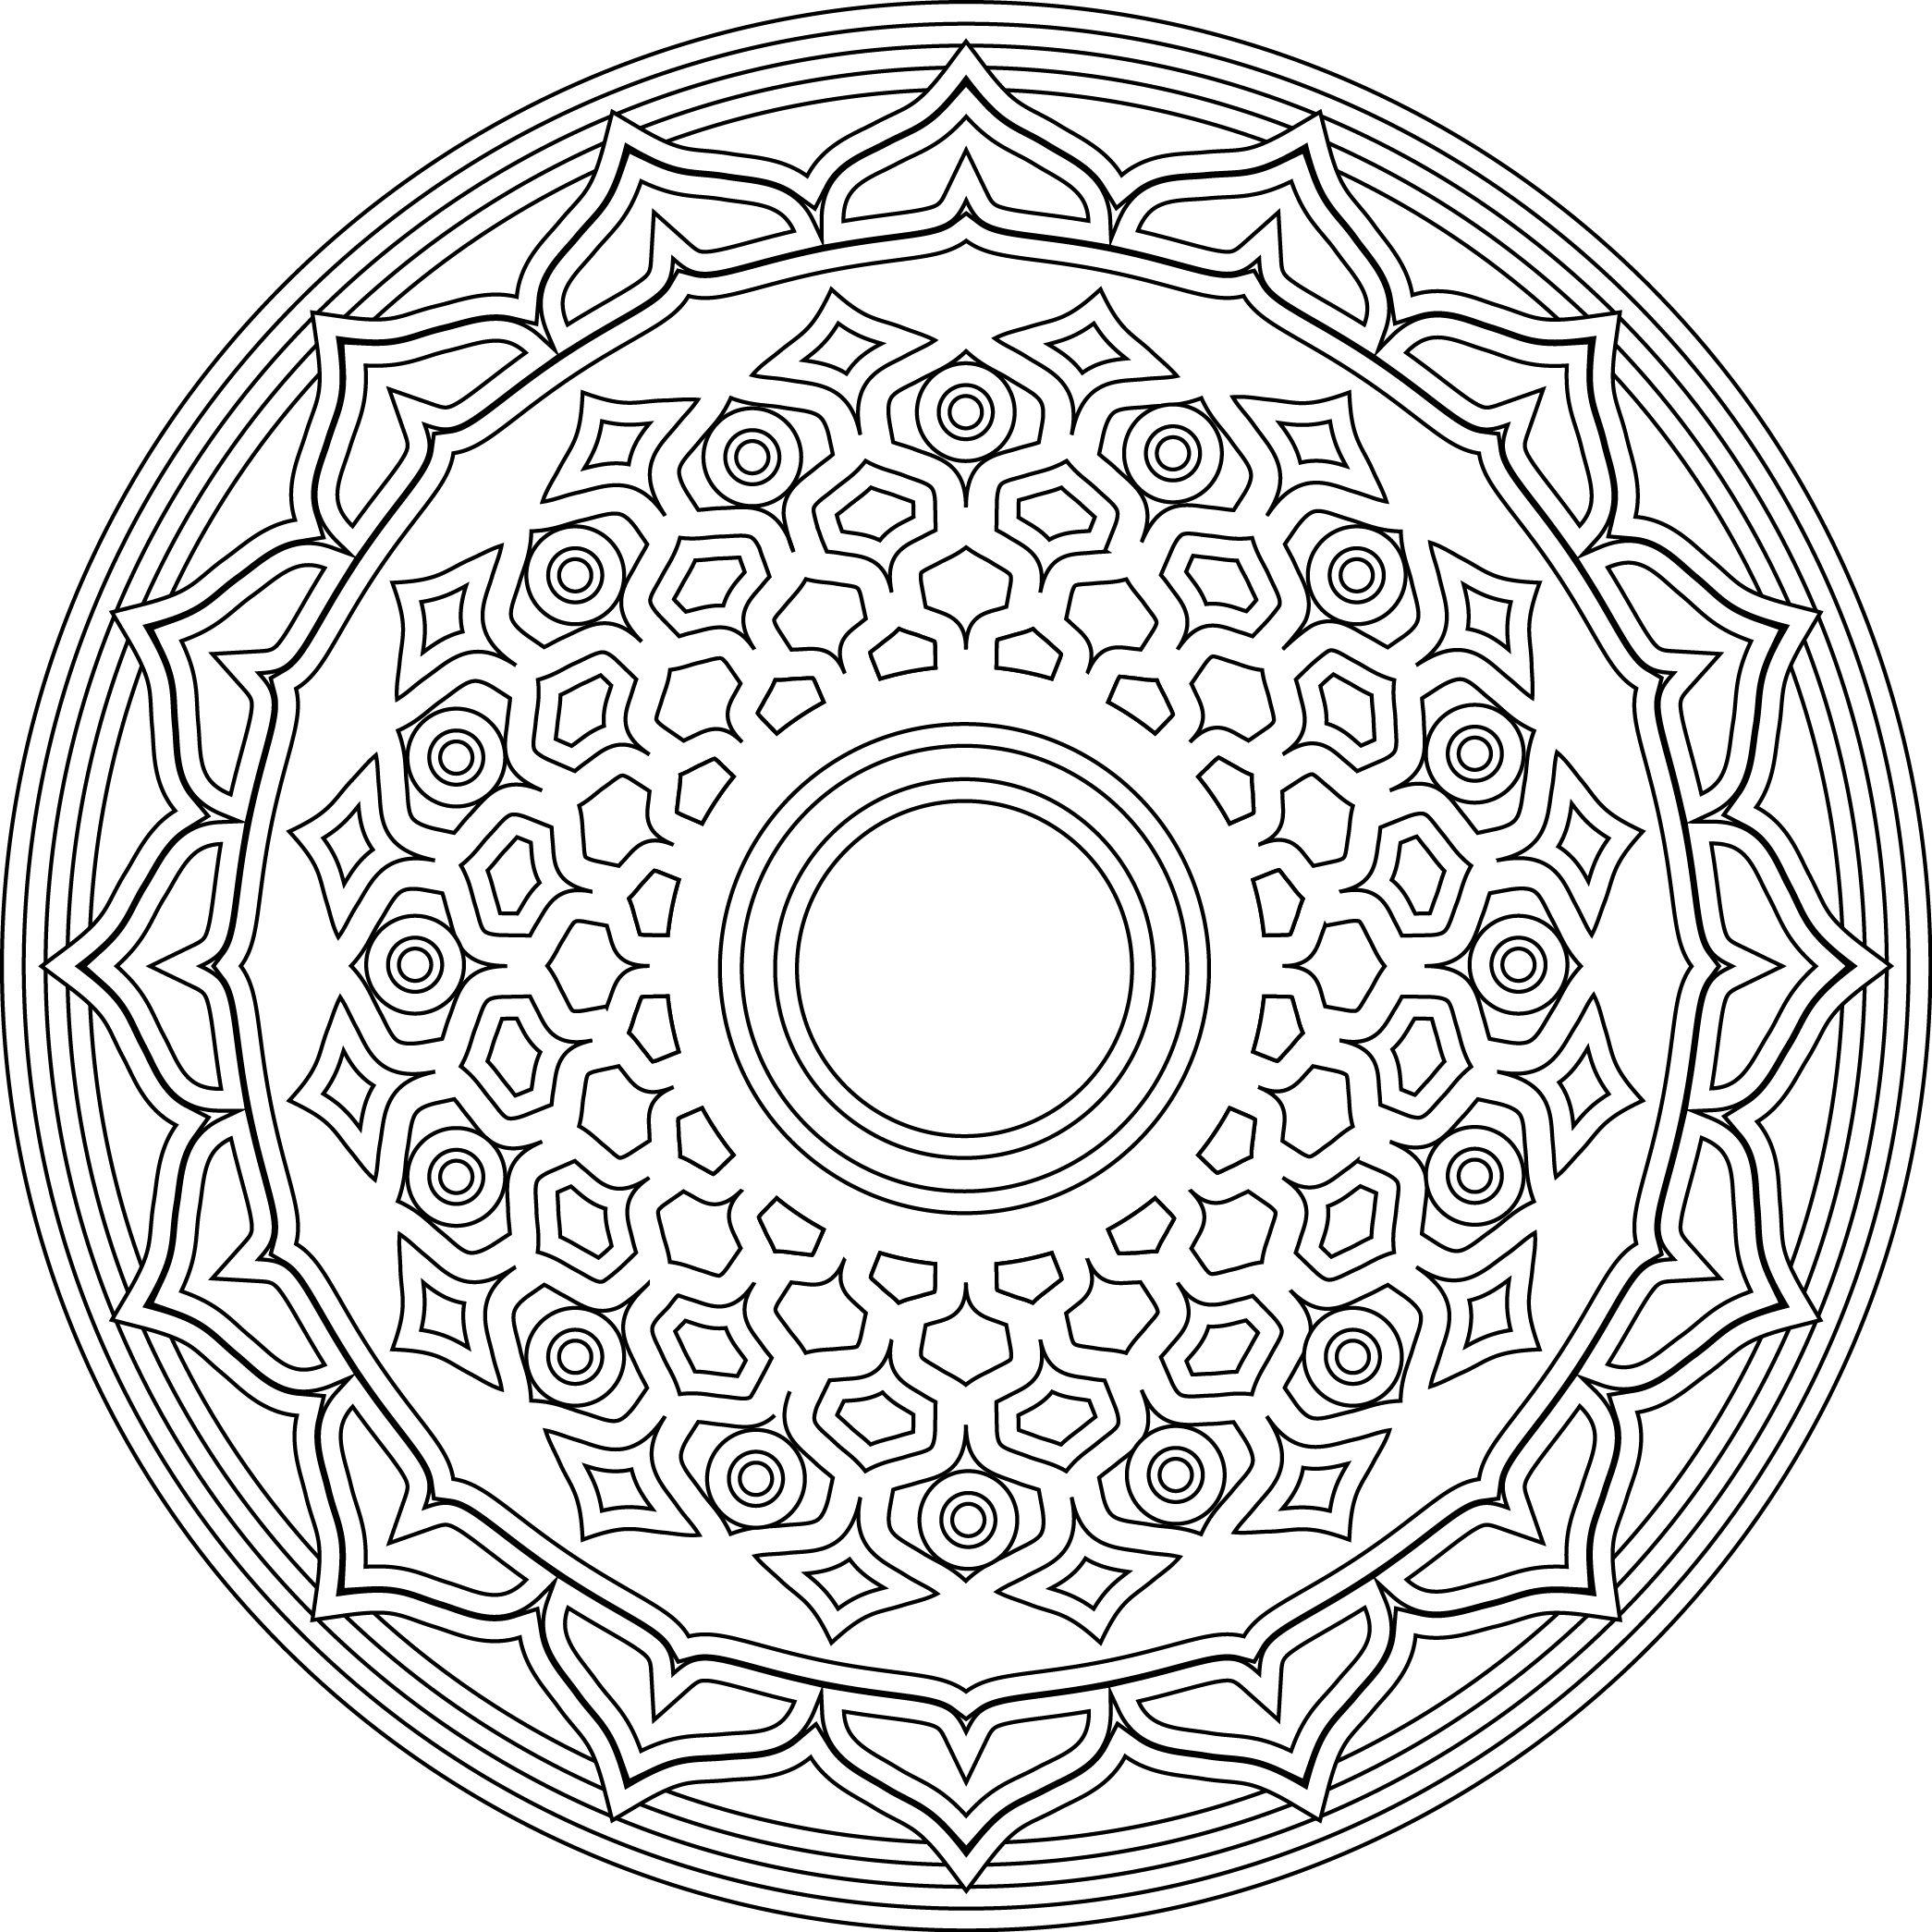 Sahasrara The Crown Chakra Mandala Coloring Pages Coloring Pages Mandala Coloring